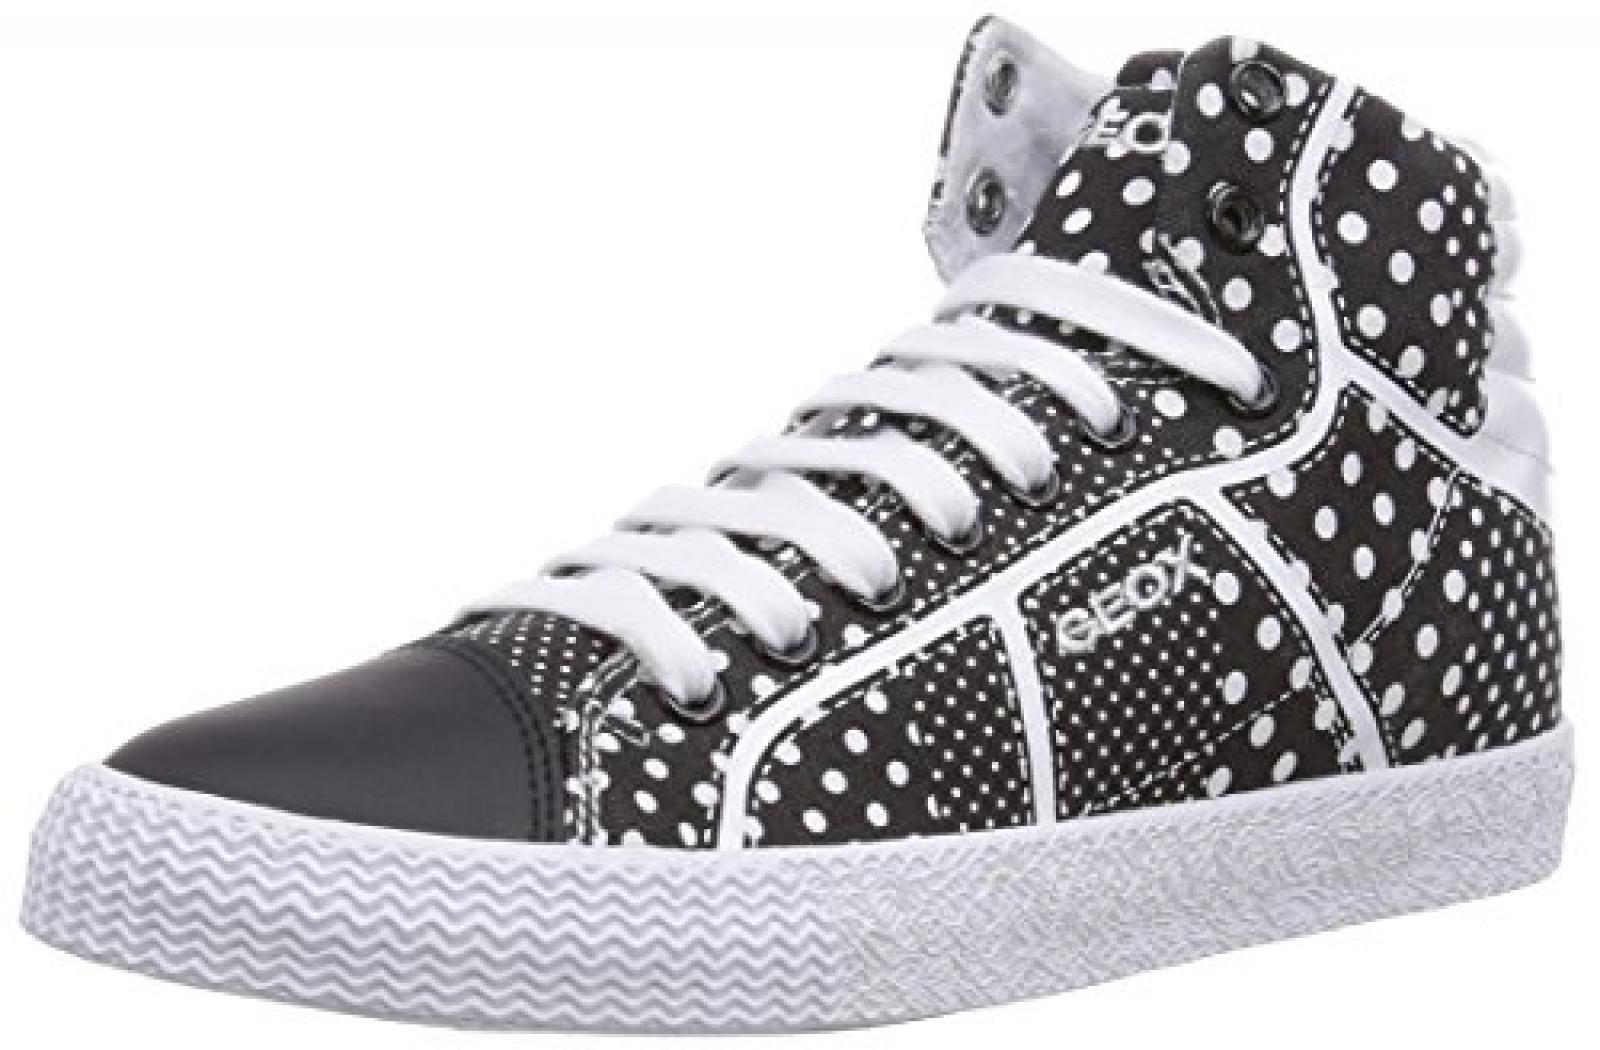 Geox J SMART C Mädchen Hohe Sneakers